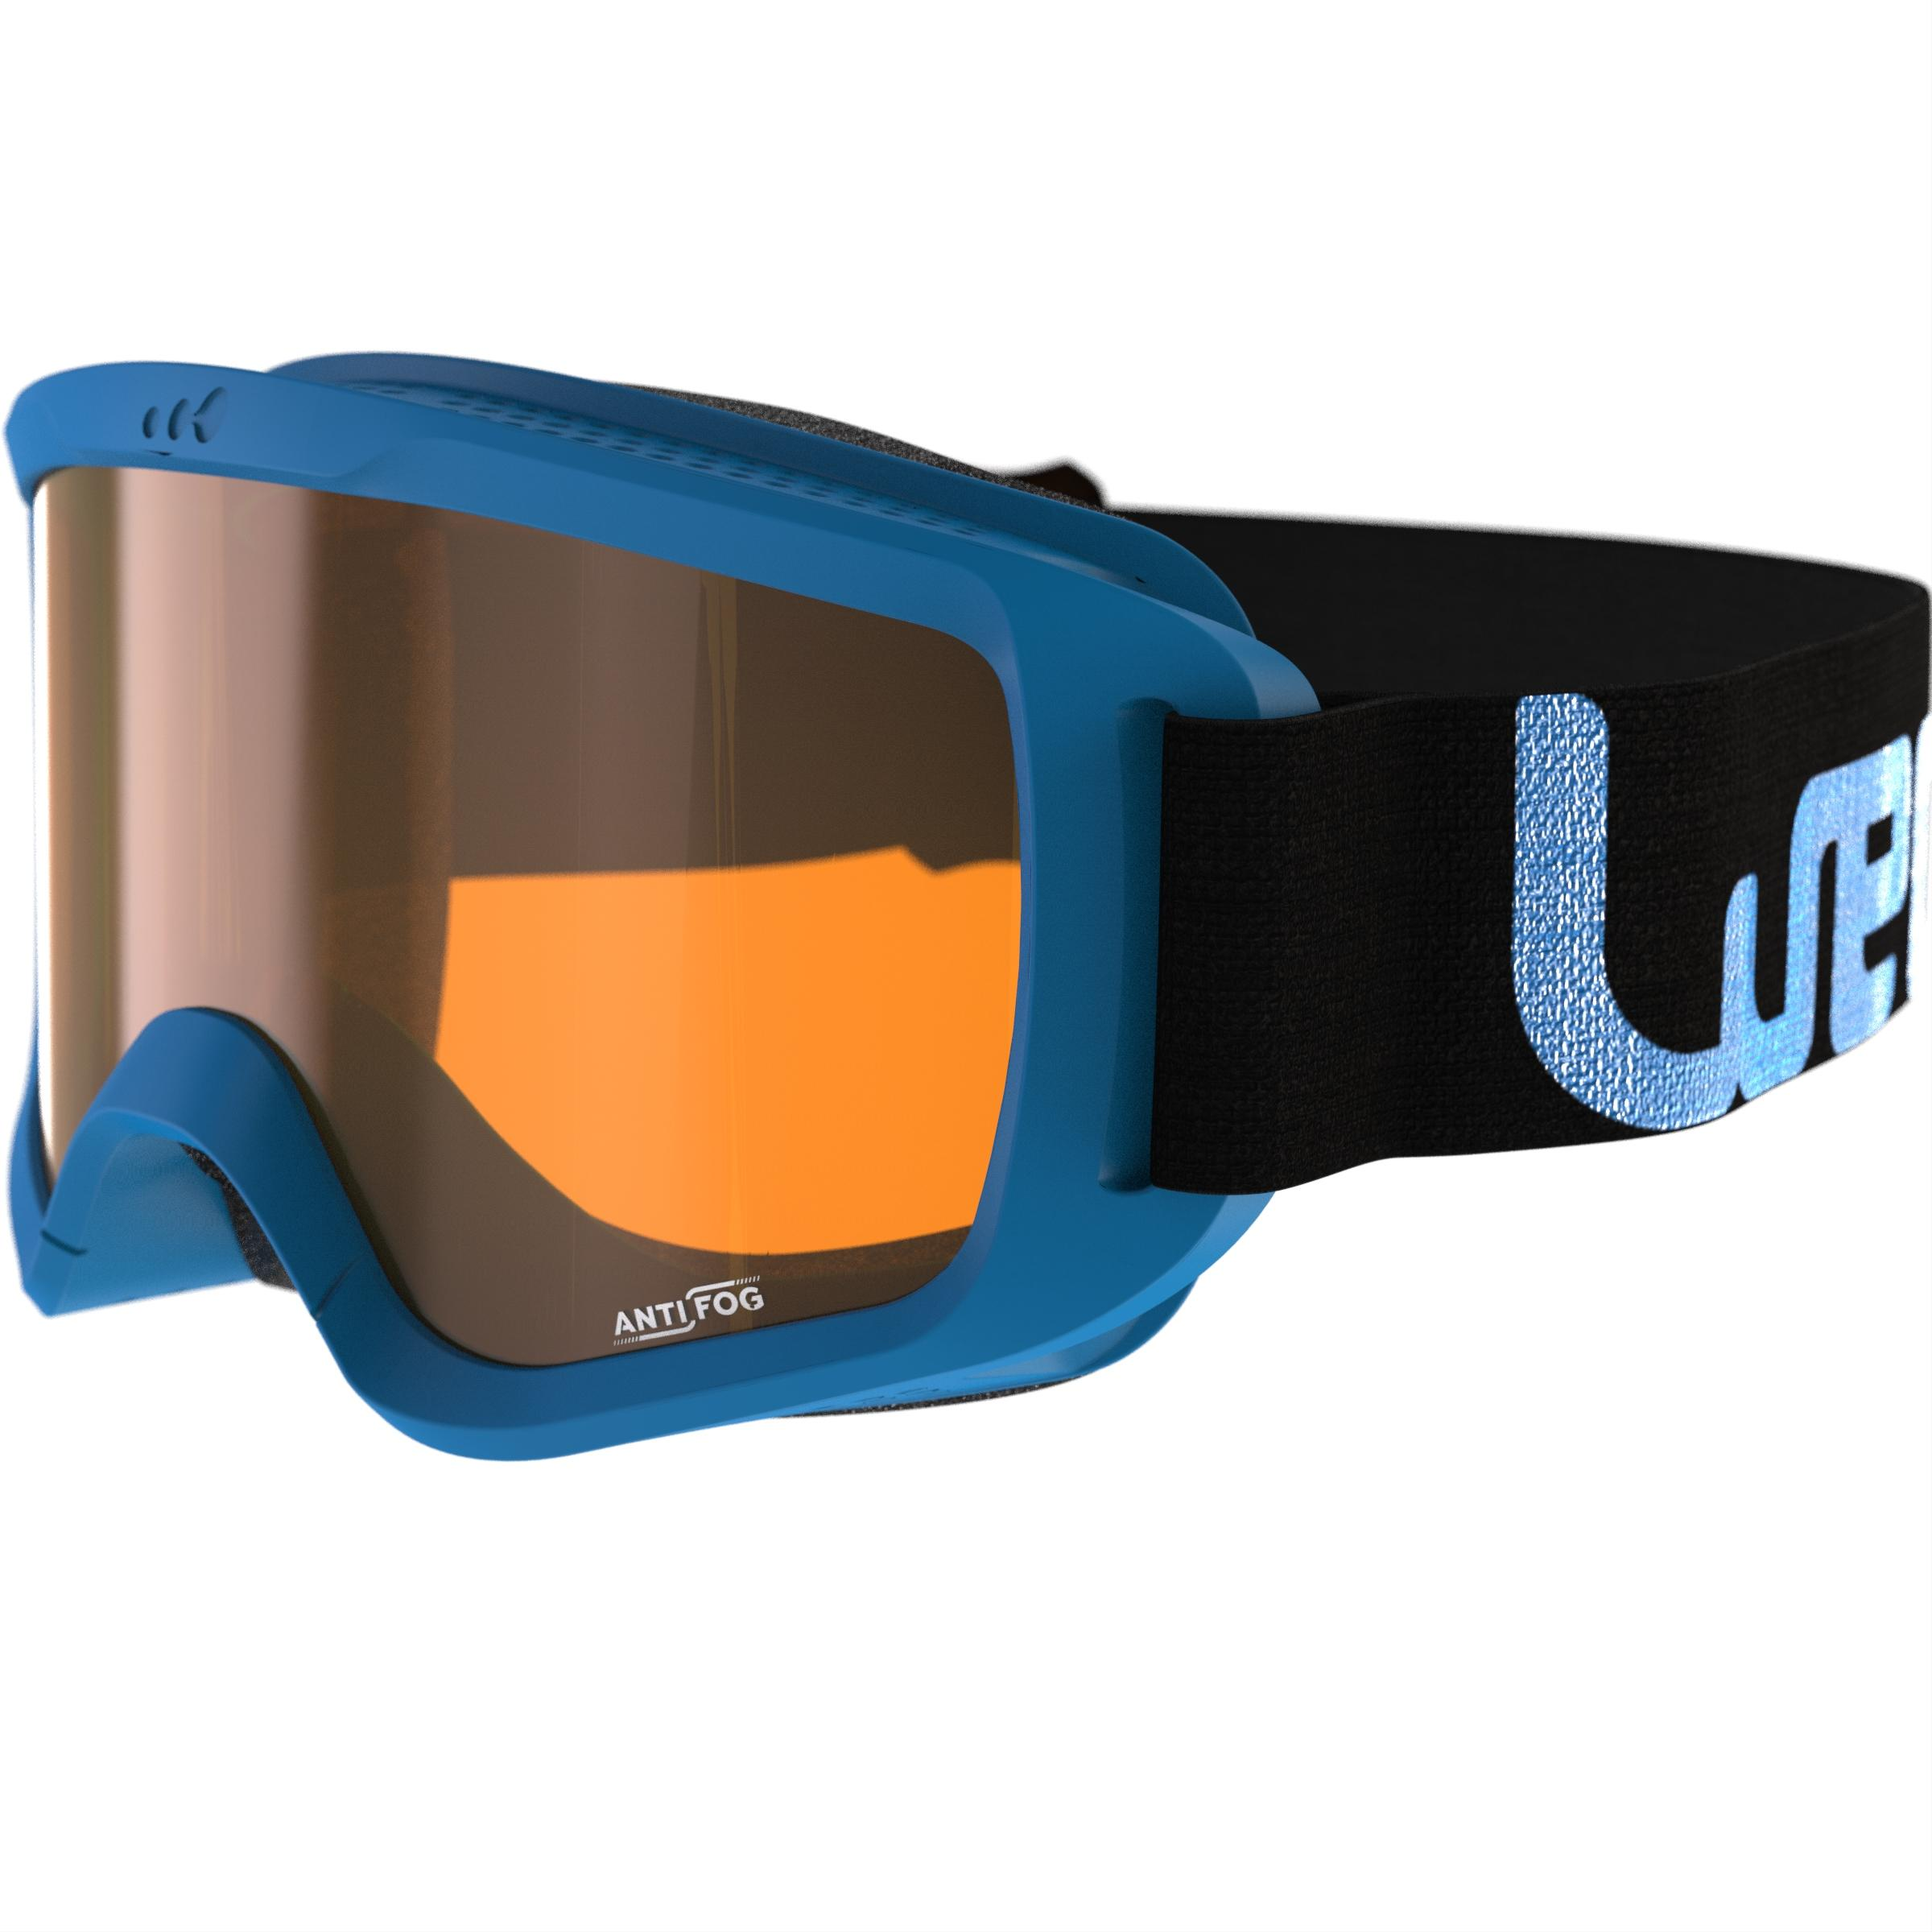 Wed'ze Ski- en snowboardbril Snow 100 zonnig weer blauw - P thumbnail